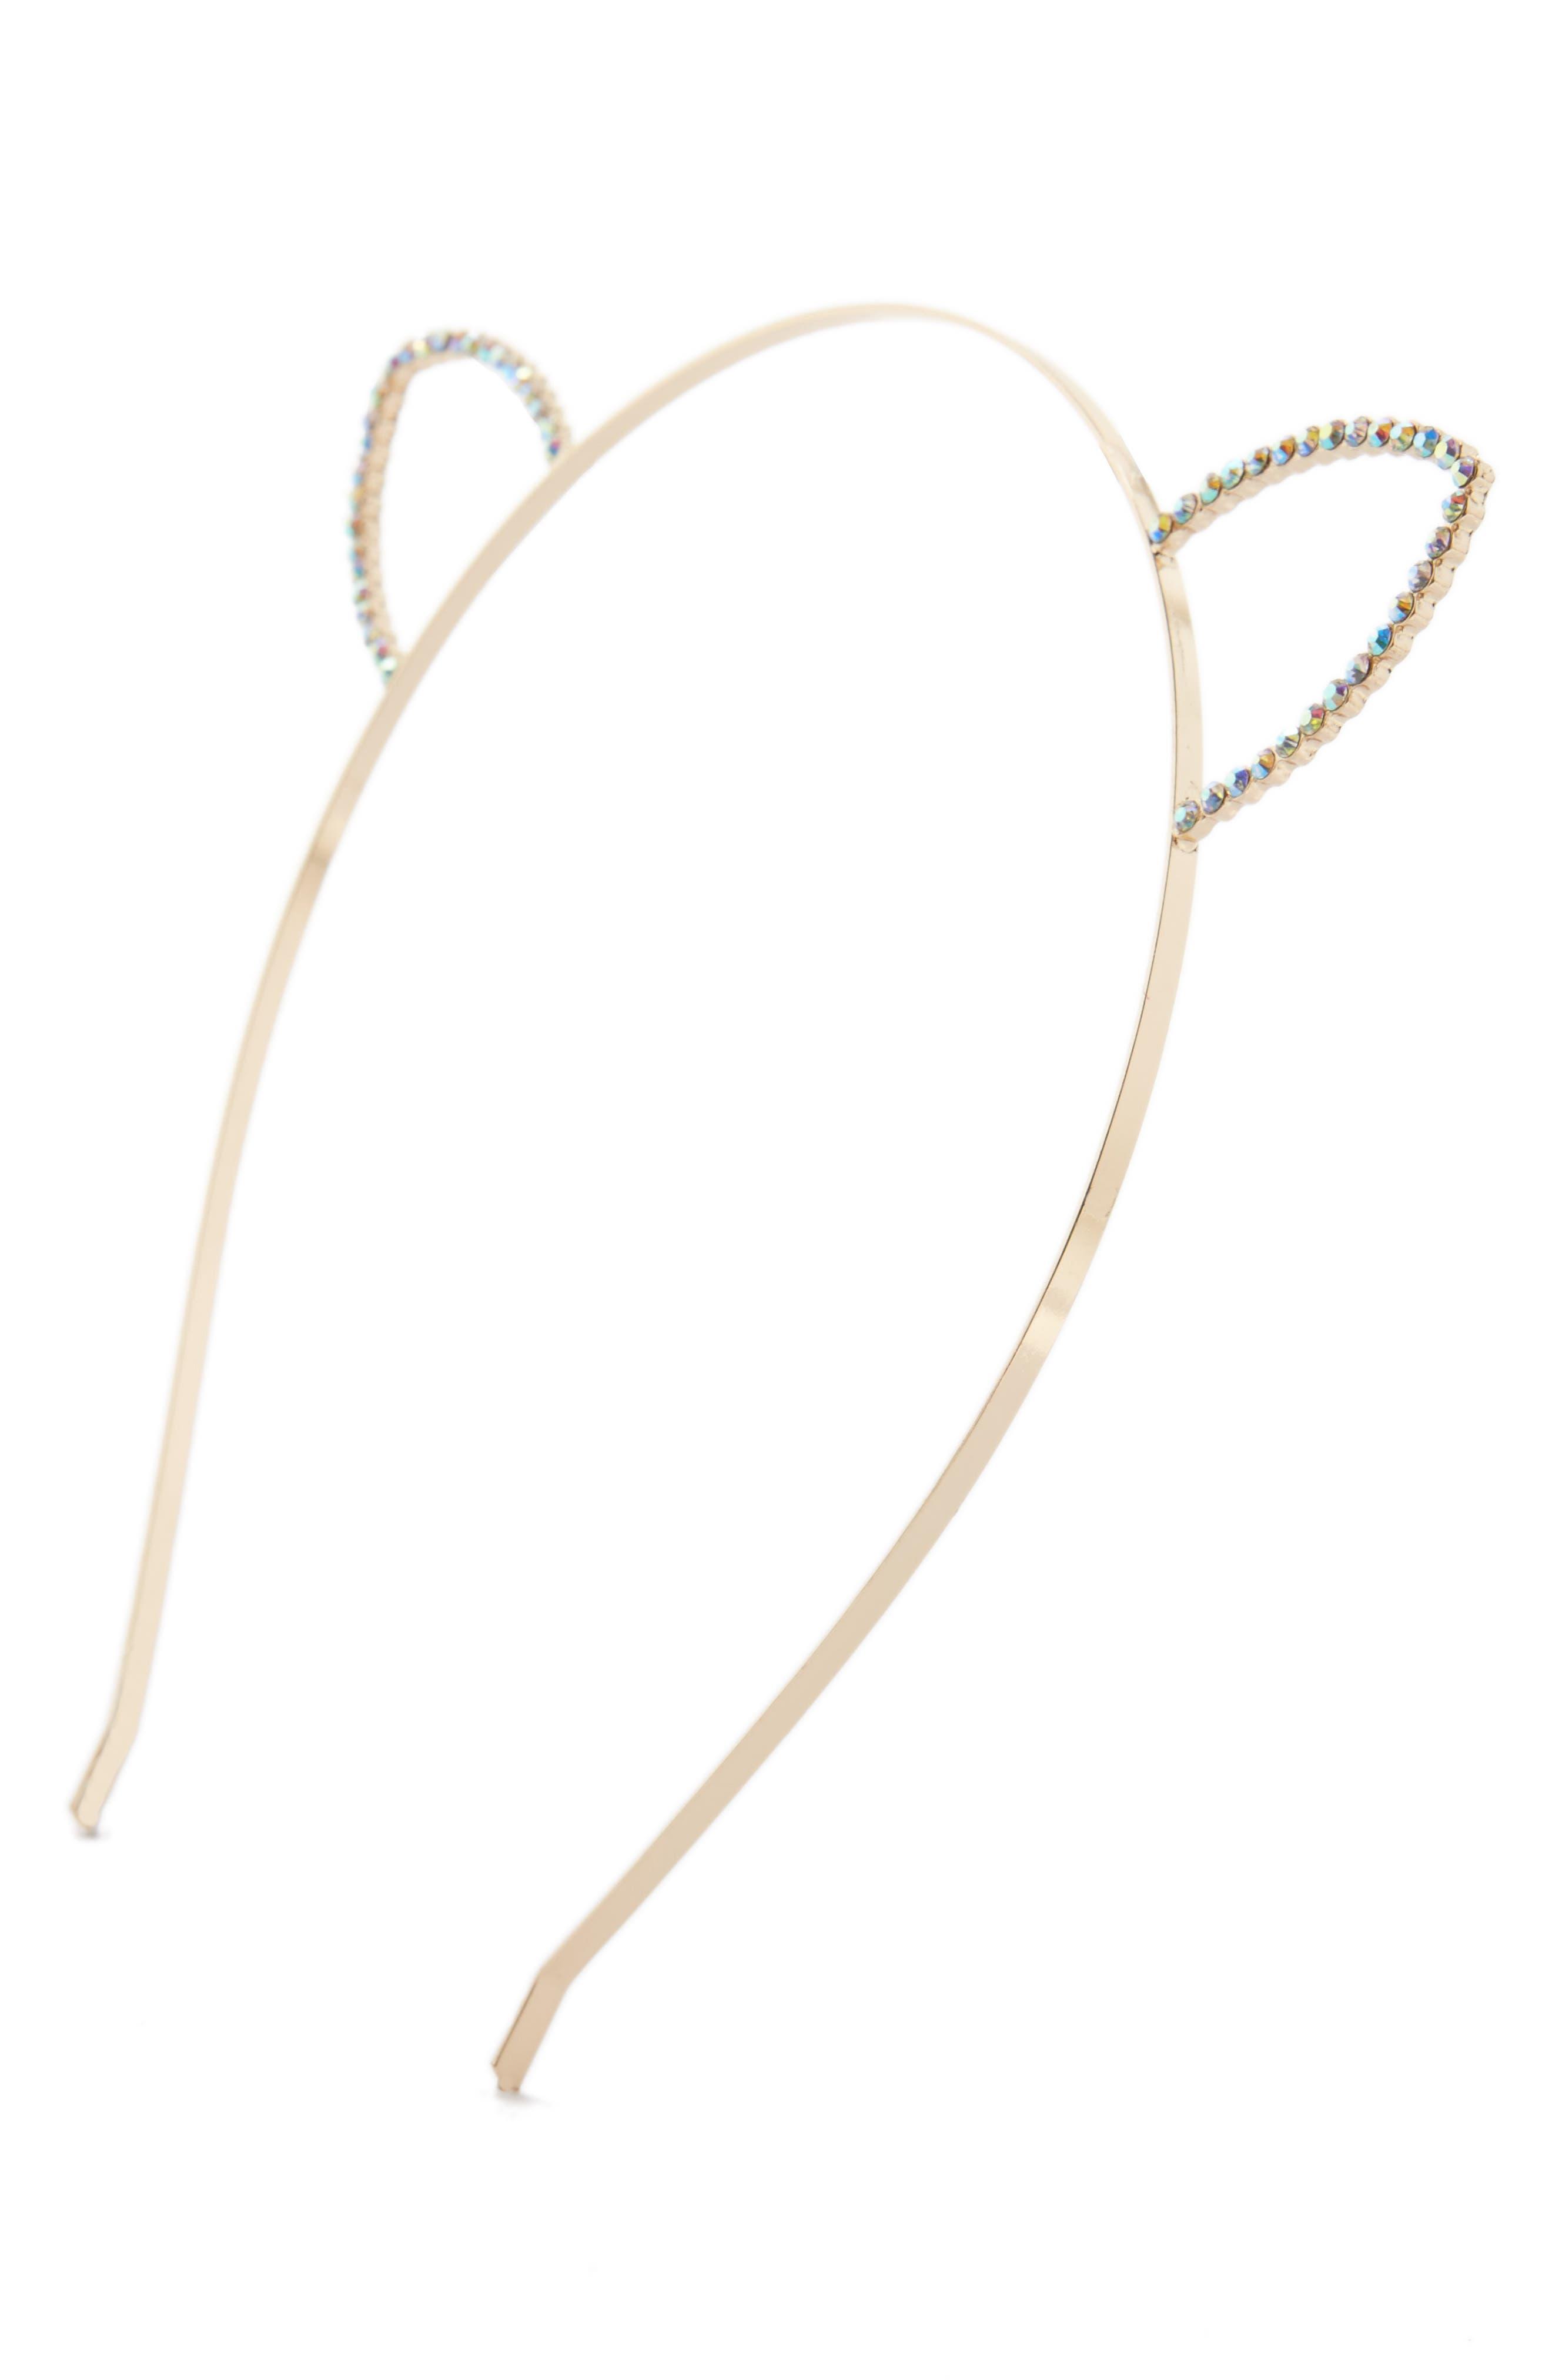 Shinhwa Crystal Cat Ear Headband